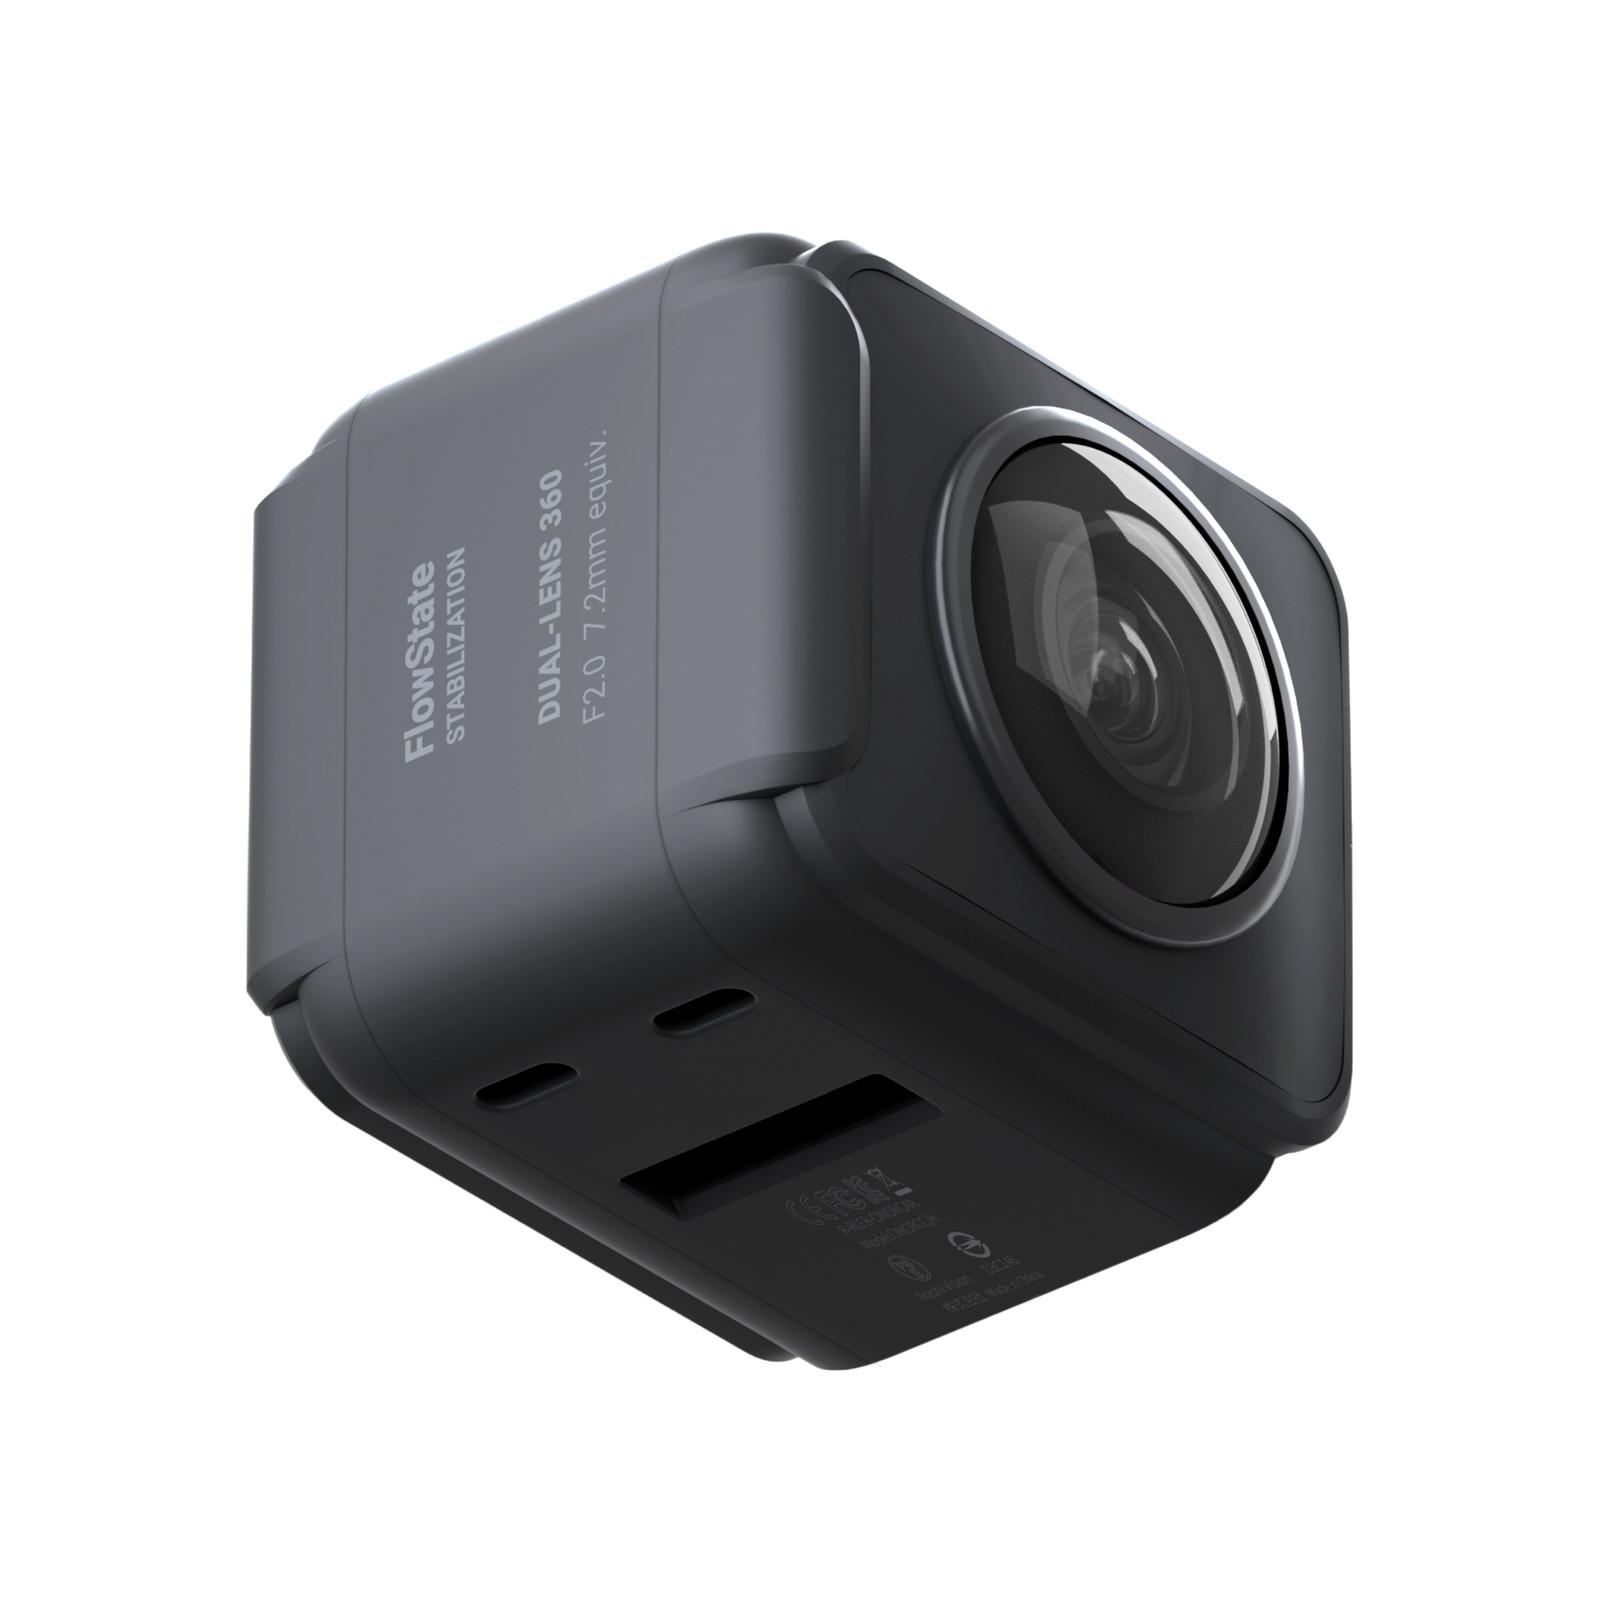 Insta360-ONE R - 360 MOD